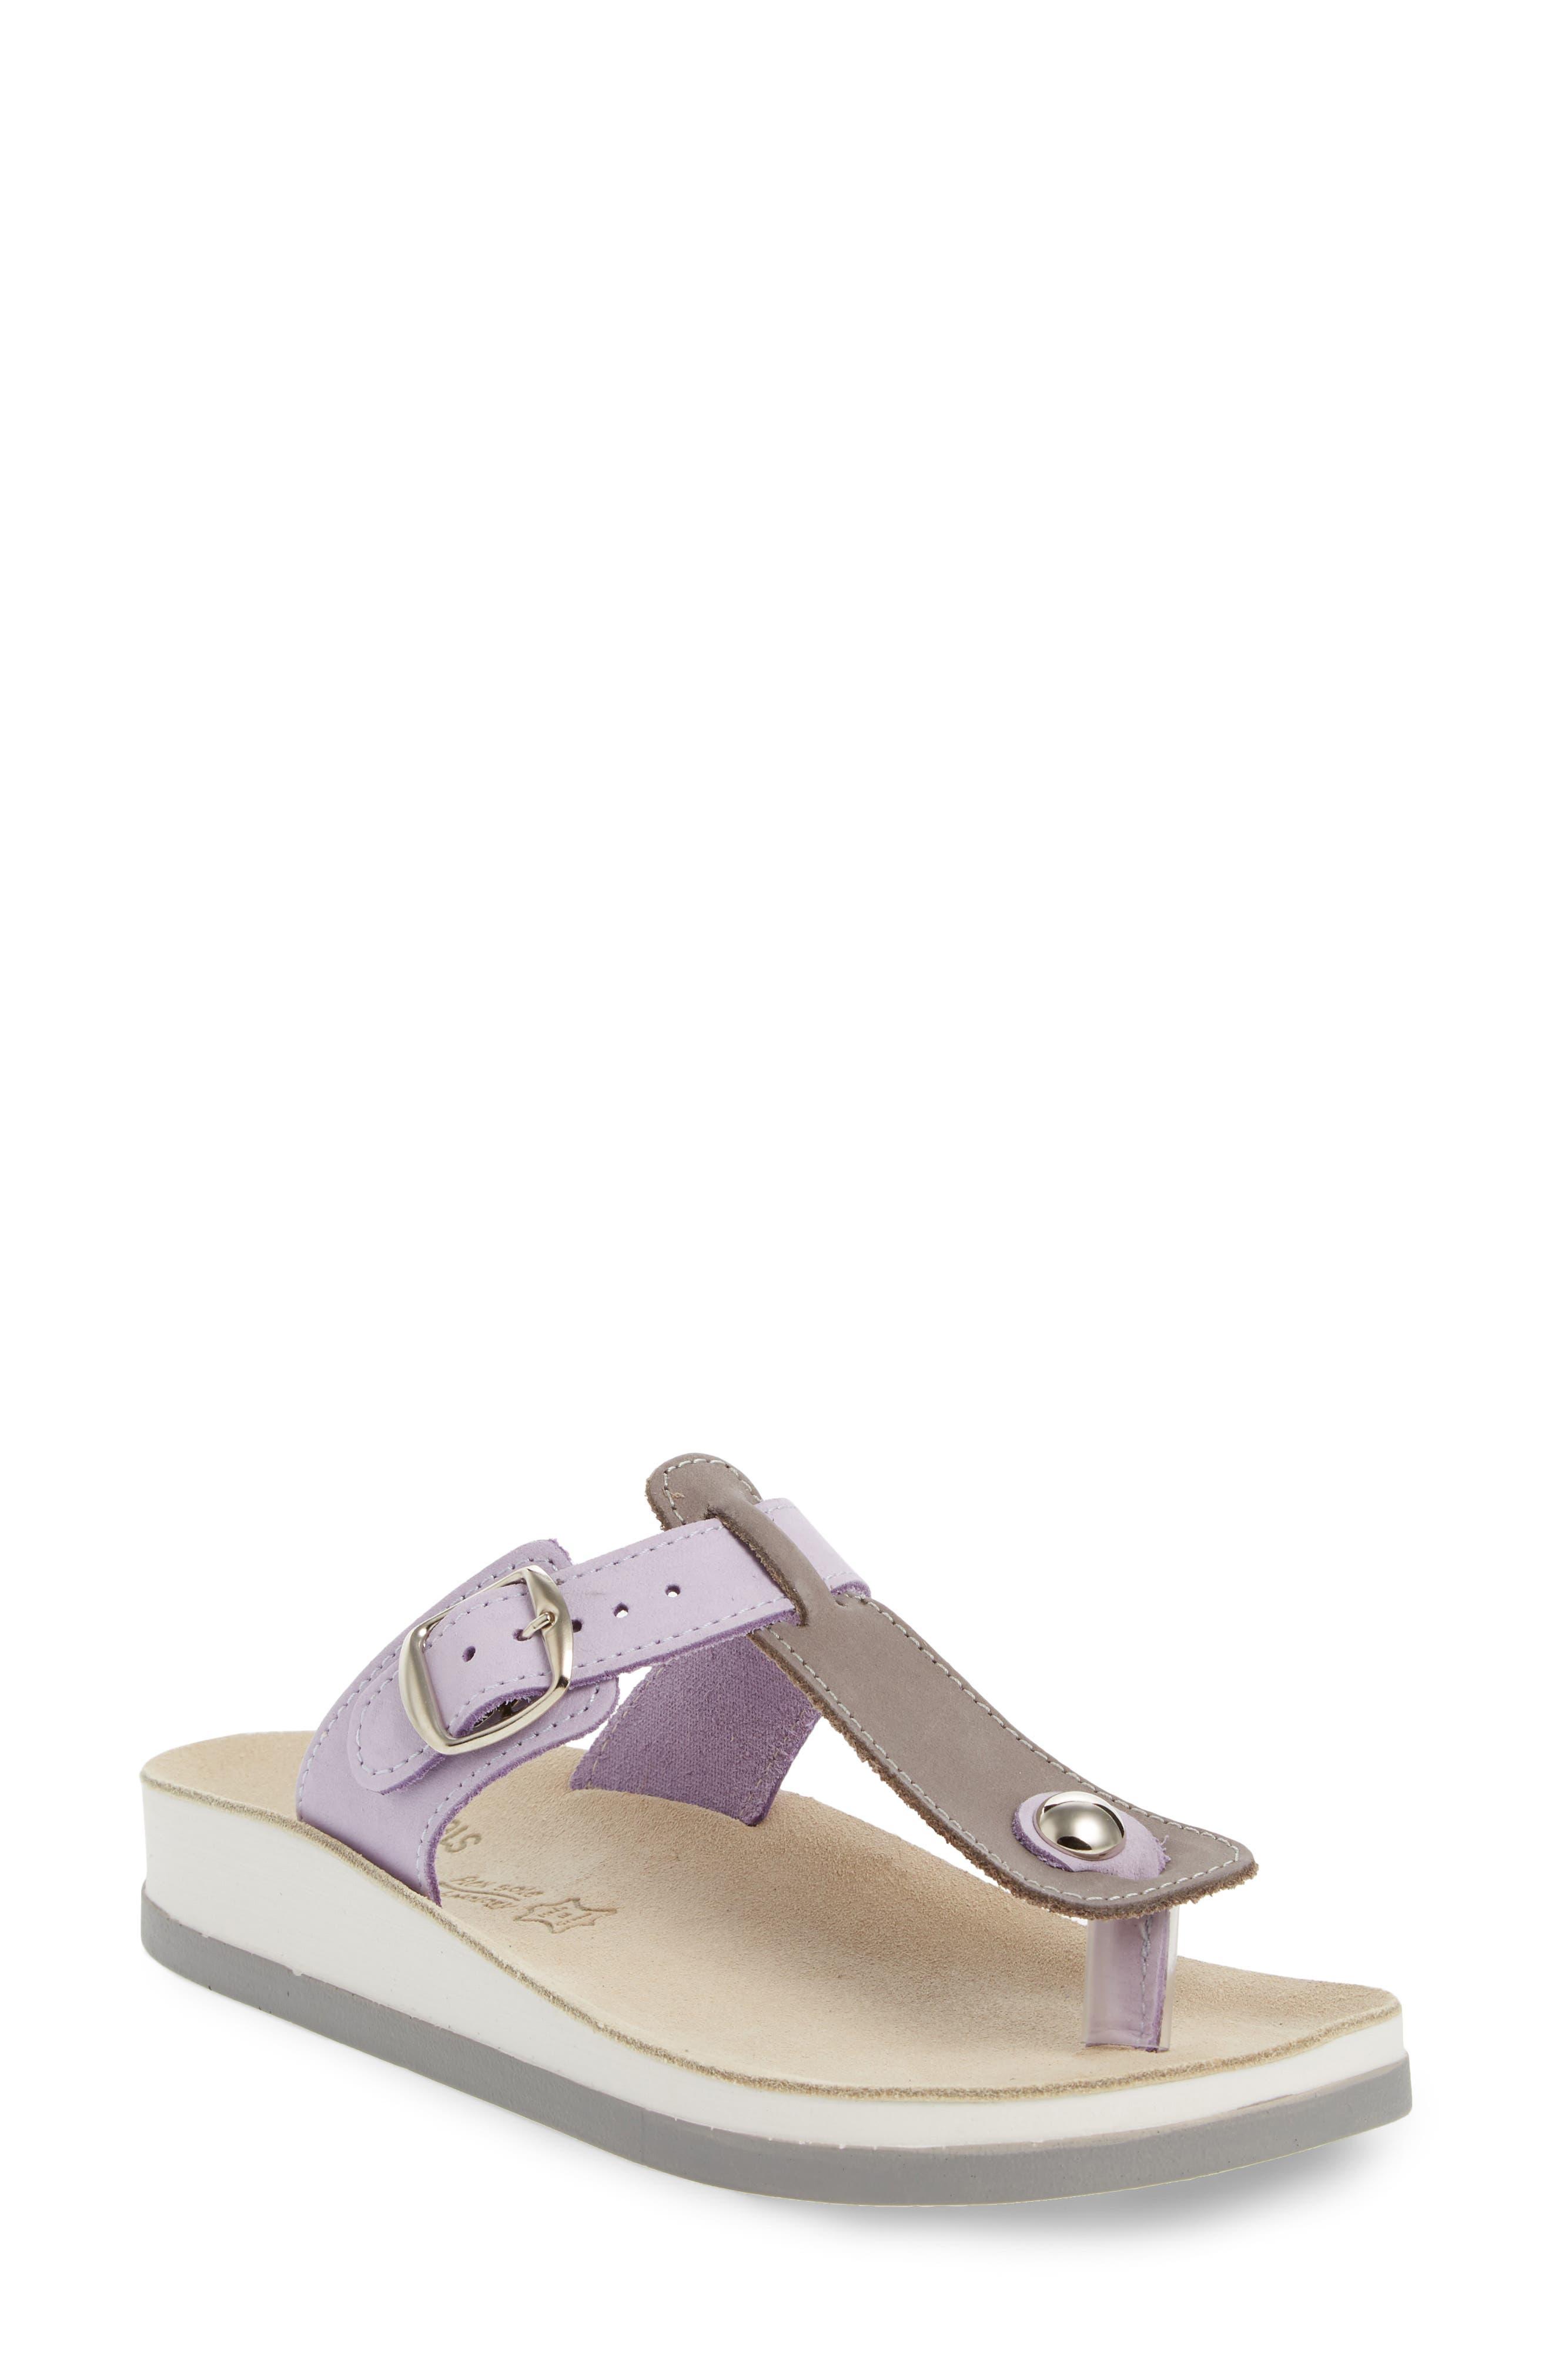 Viola Sandal,                         Main,                         color, Lila Grey Leather